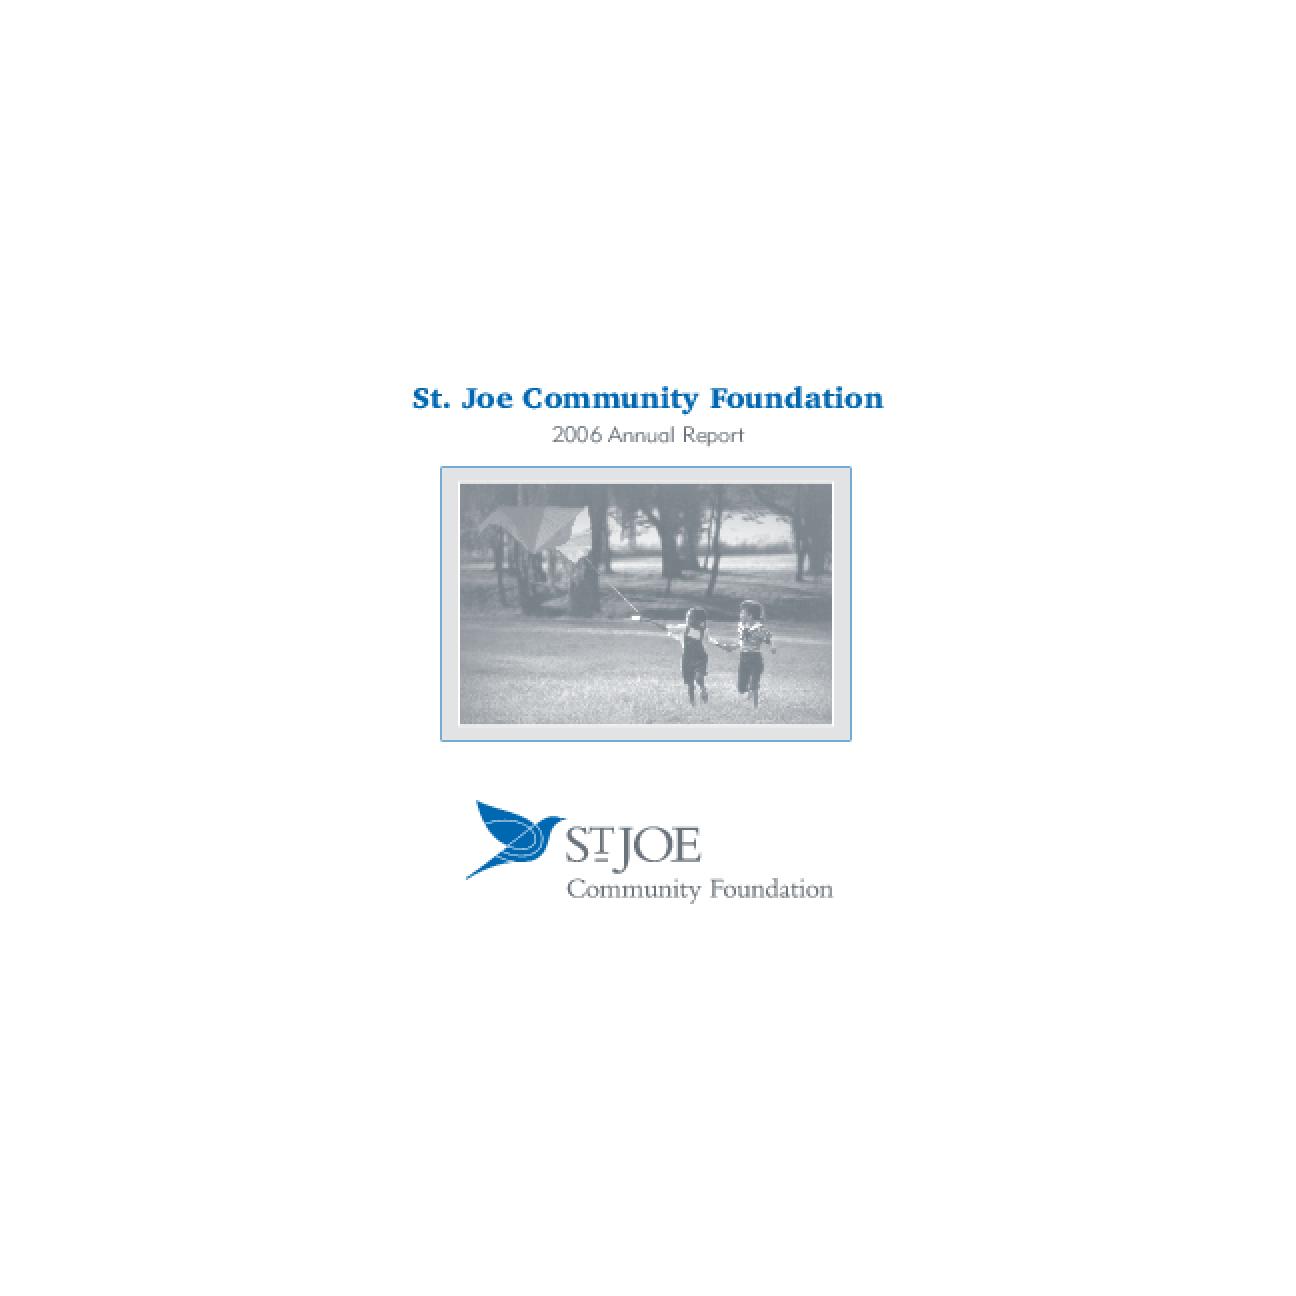 St. Joe Community Foundation - 2006 Annual Report